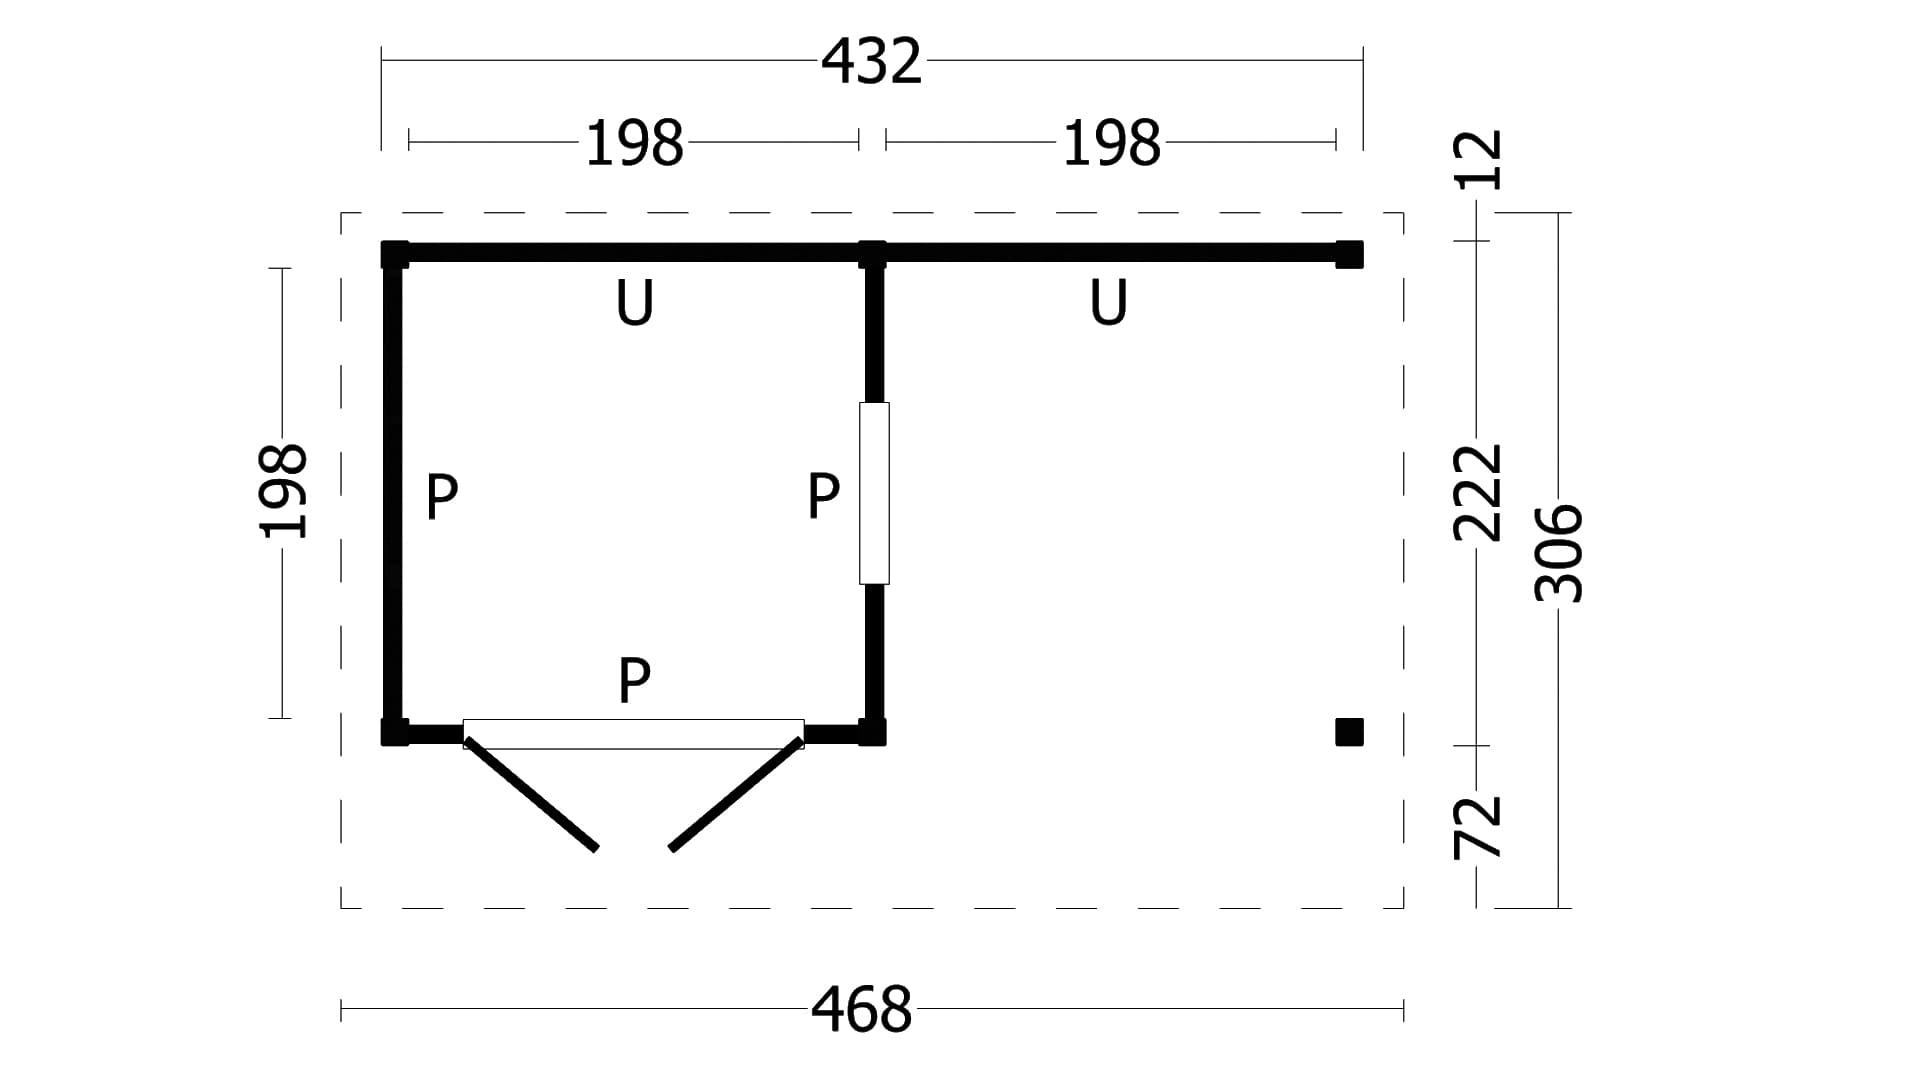 Montovaná chata Bergen 3 L